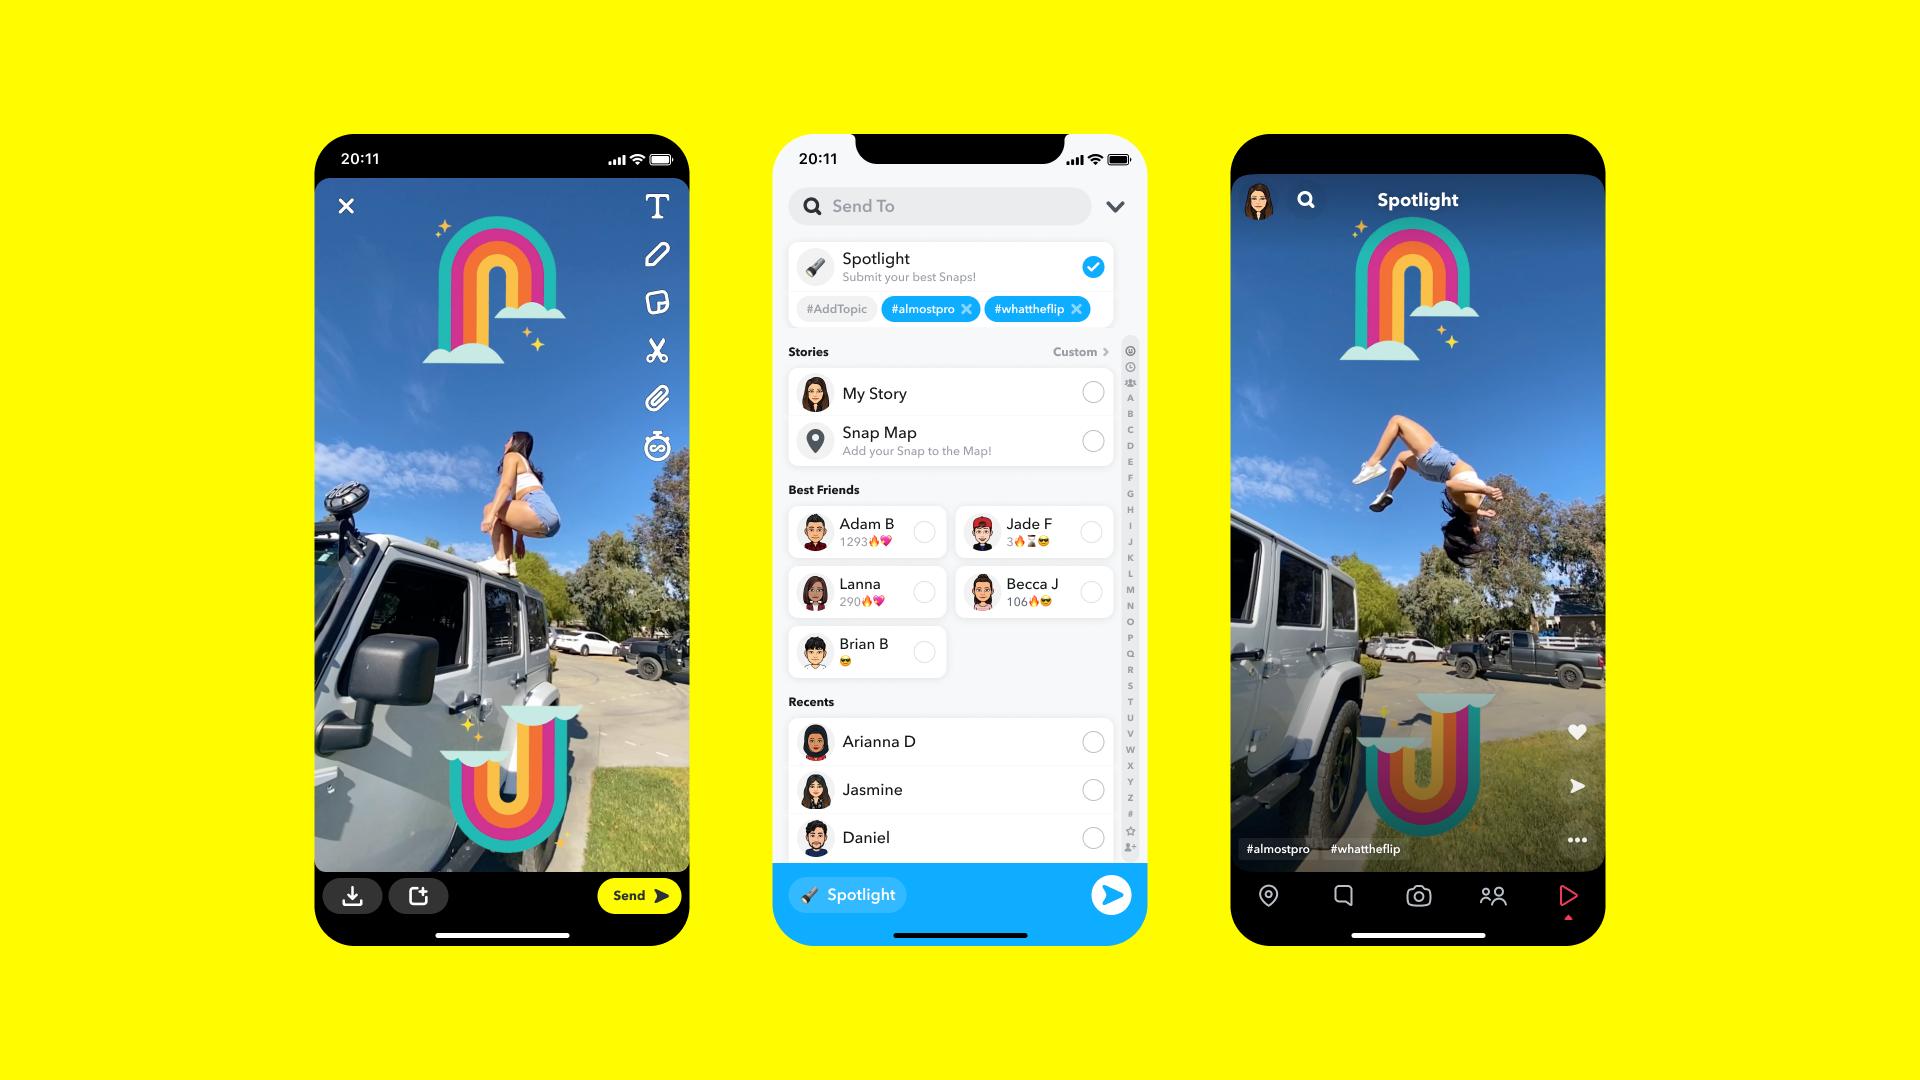 Snapchat Adds Spotlight